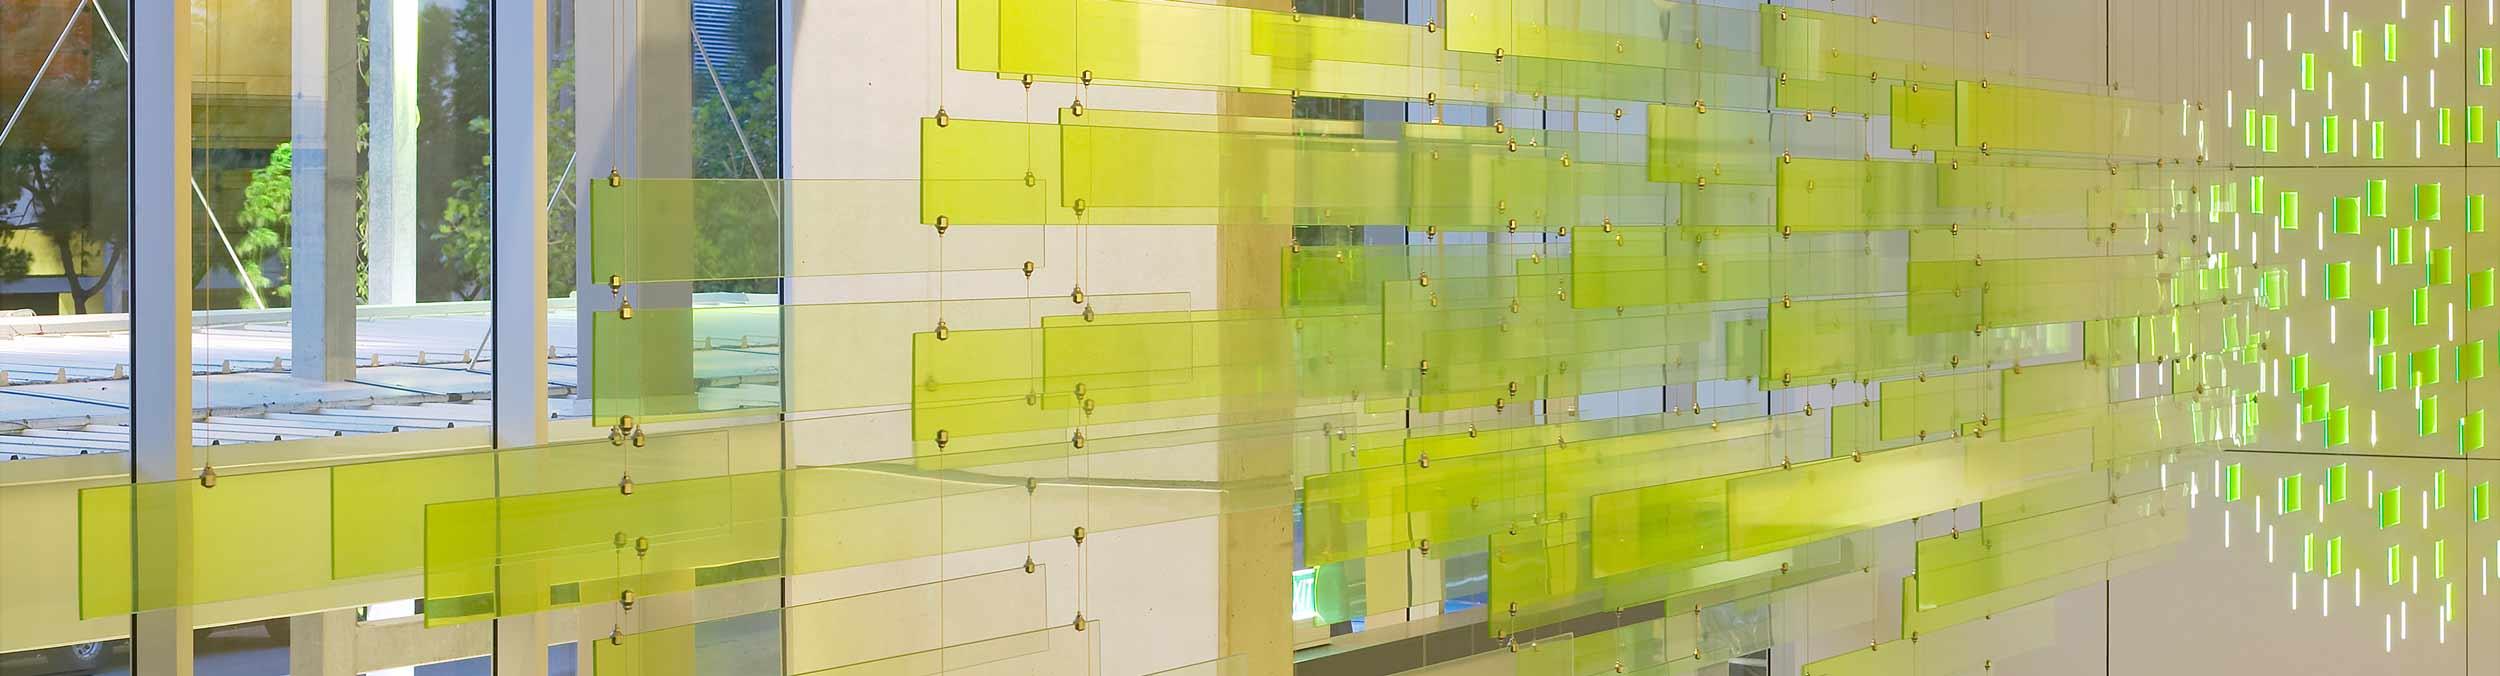 [Translate to English:] POSILOCK Seil-Abhängesystem Carl Stahl Architektur